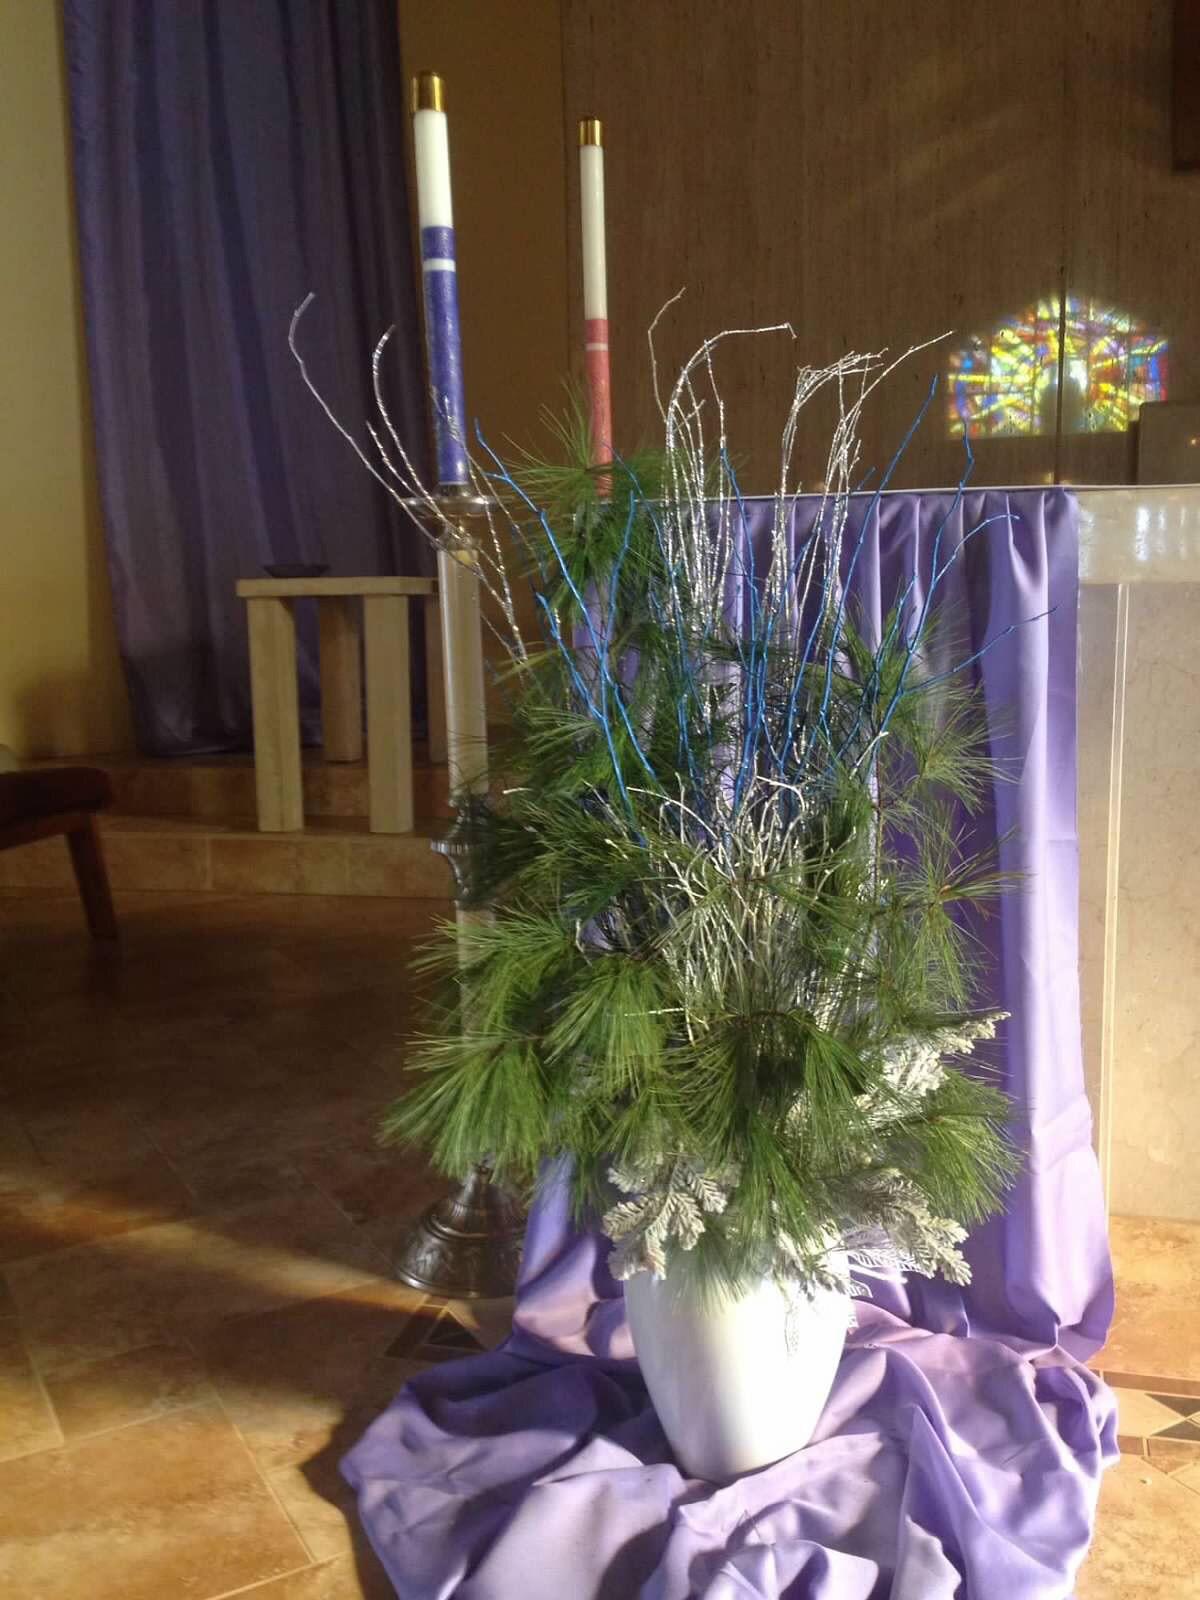 Church altar decor fabric and vase of fresh greens